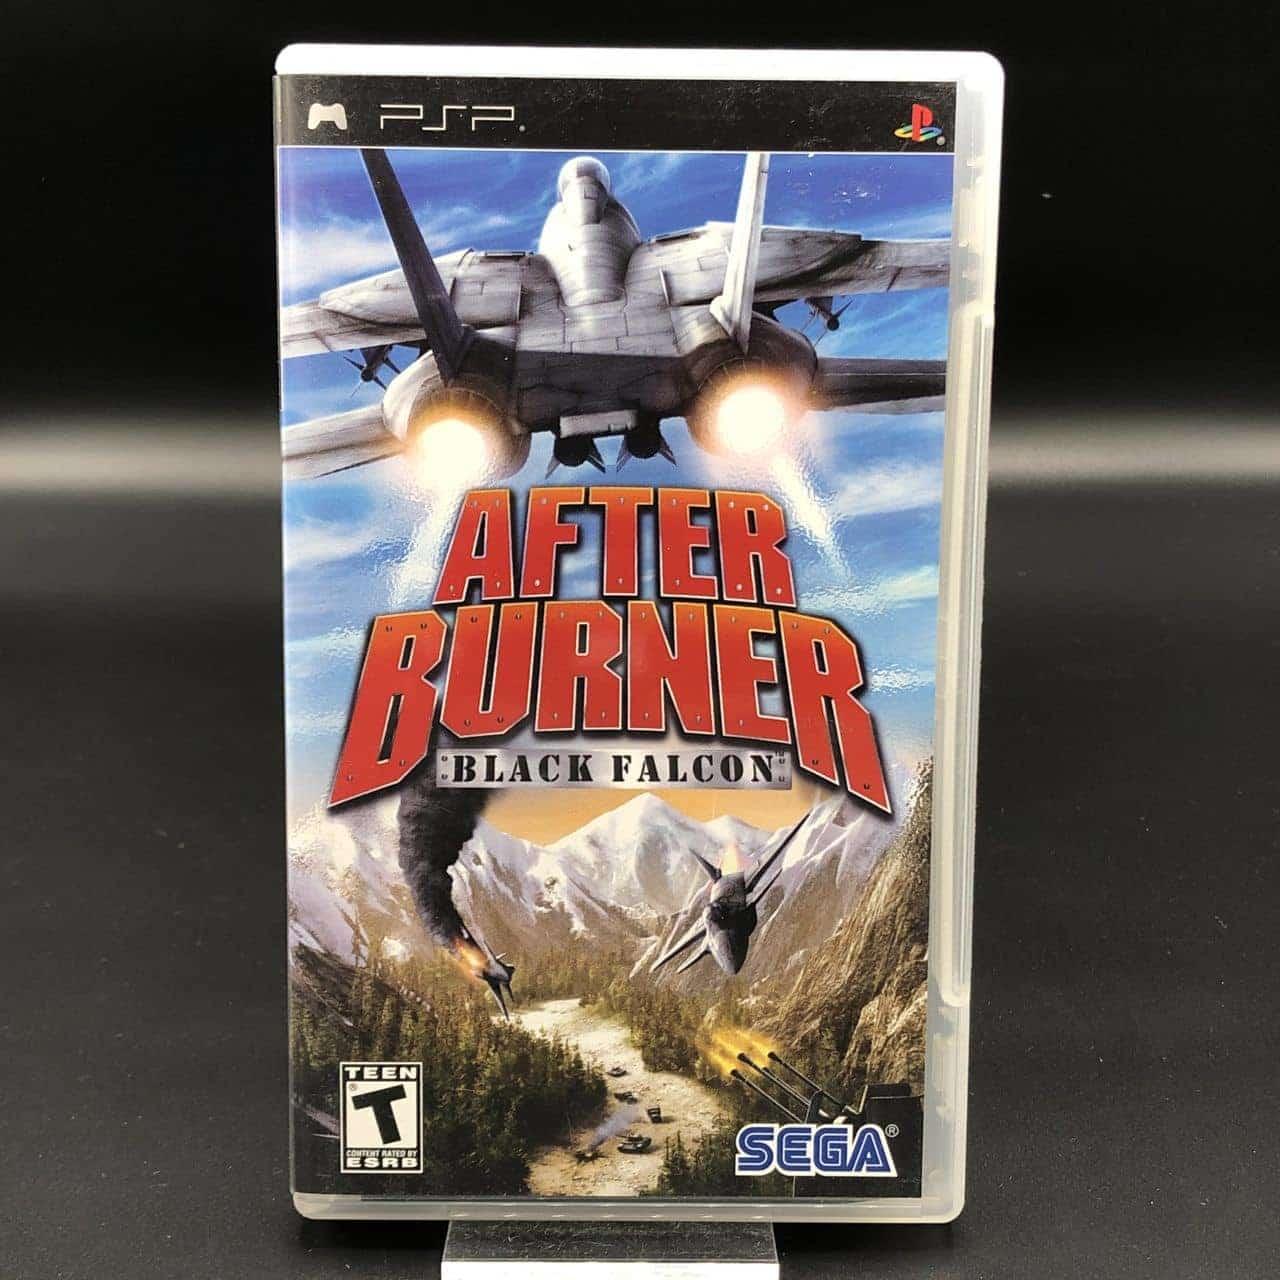 PSP After Burner: Black Falcon (Import USA) (Komplett) (Sehr gut) Sony PlayStation Portable